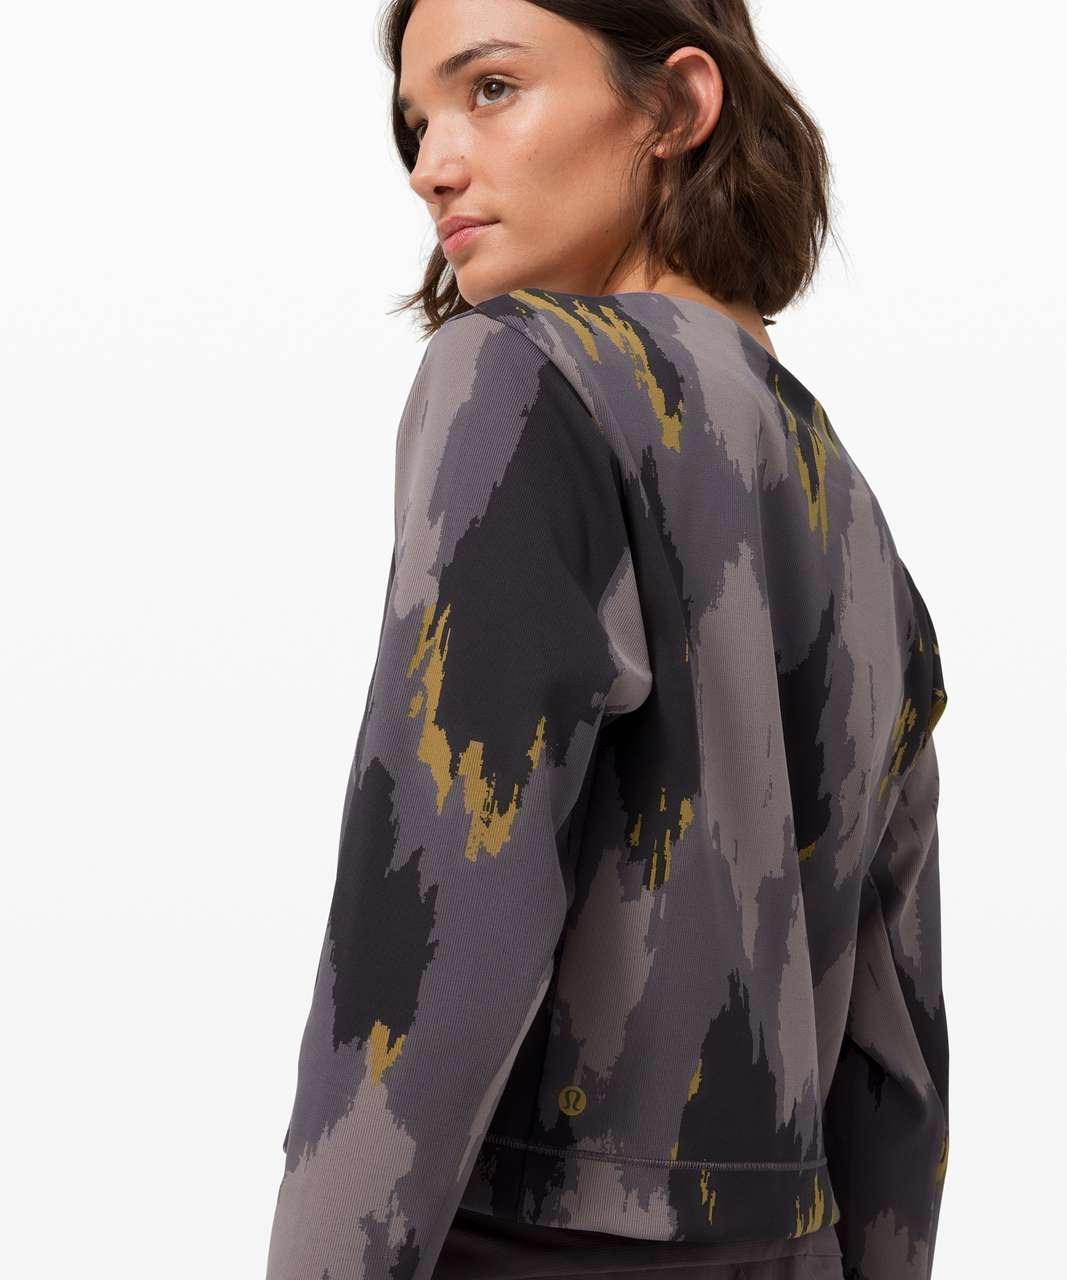 Lululemon Take The Moment Long Sleeve Sweatshirt *lululemon x Robert Geller - Distressed Camo Jacquard Moonphase Camel